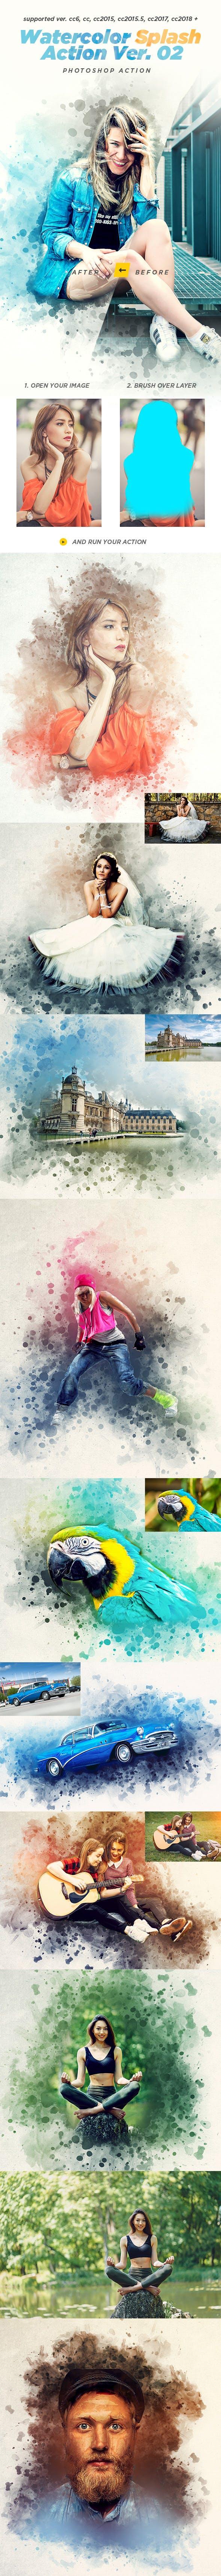 Watercolor Splash Photoshop Action Ver. 02